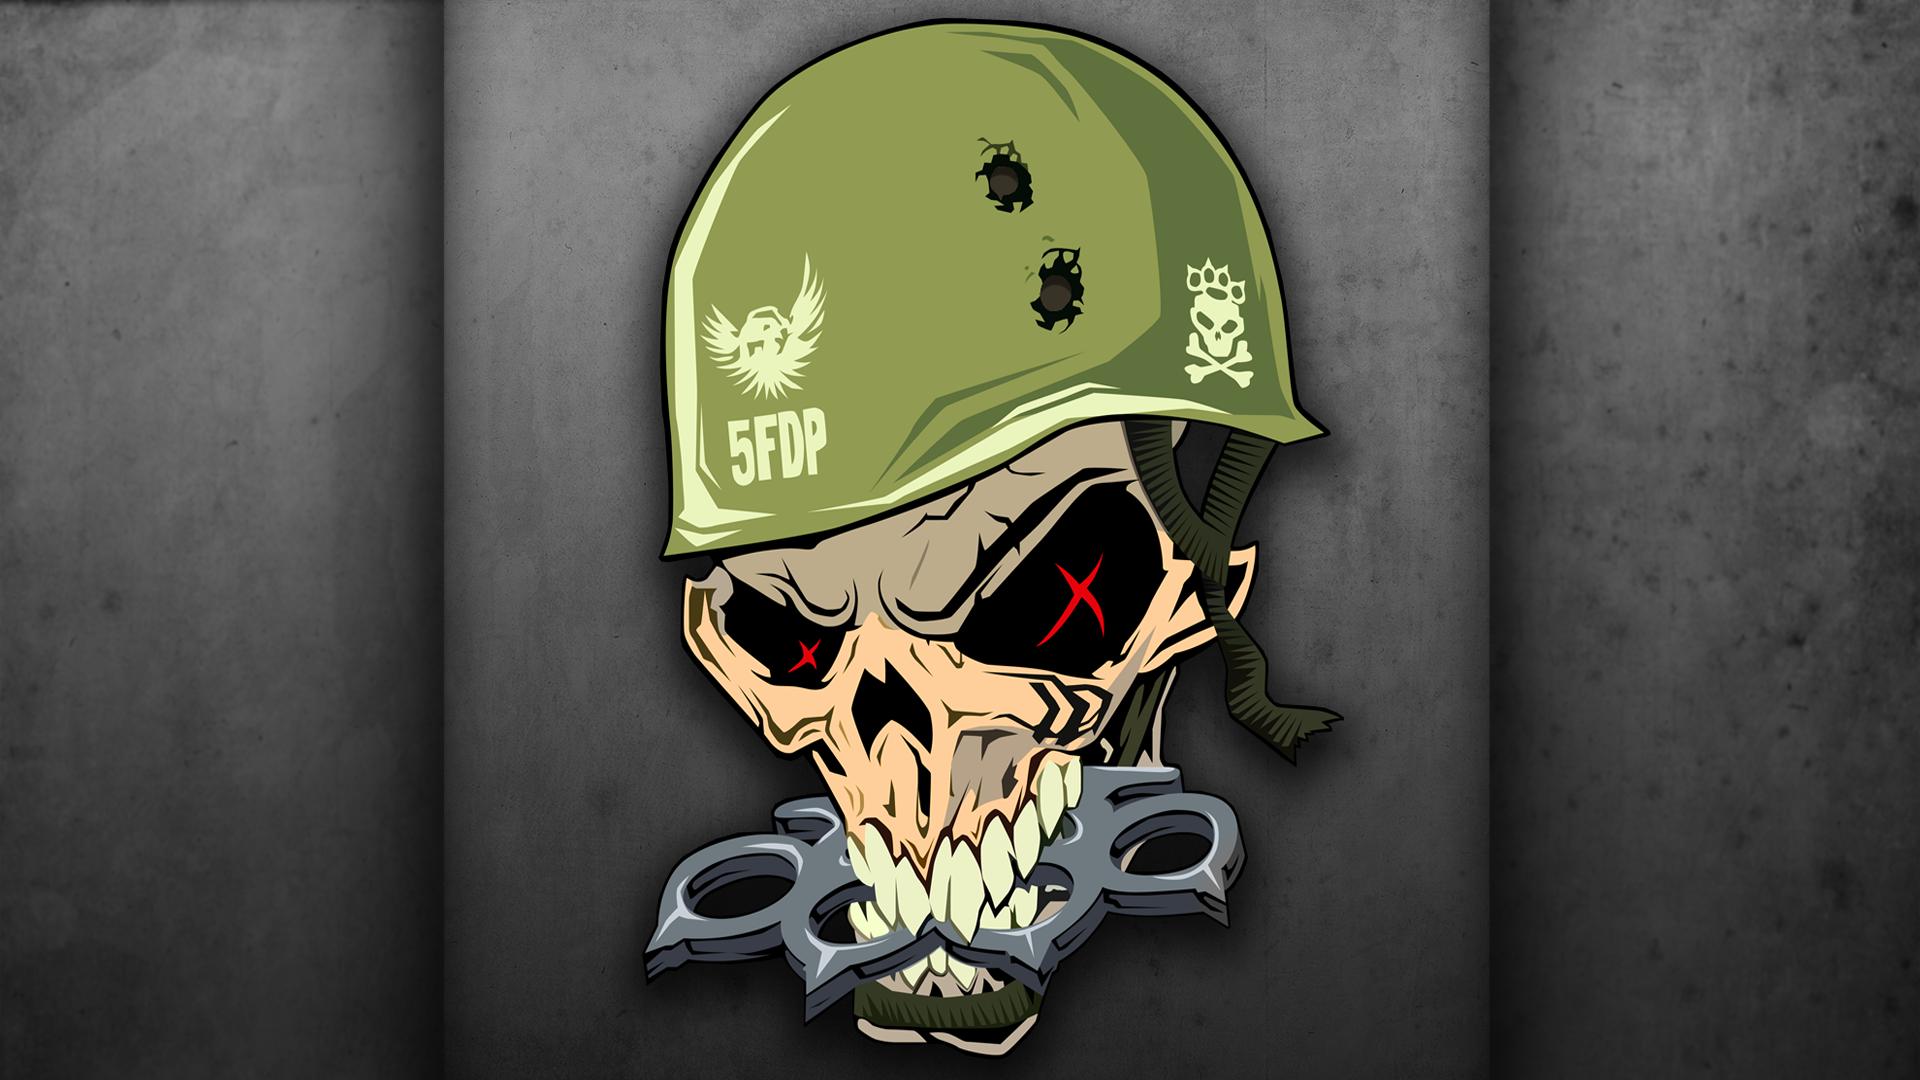 FIVE FINGER DEATH PUNCH heavy metal hard rock bands skull skulls e wallpaper | 1920x1080 | 74286 | WallpaperUP